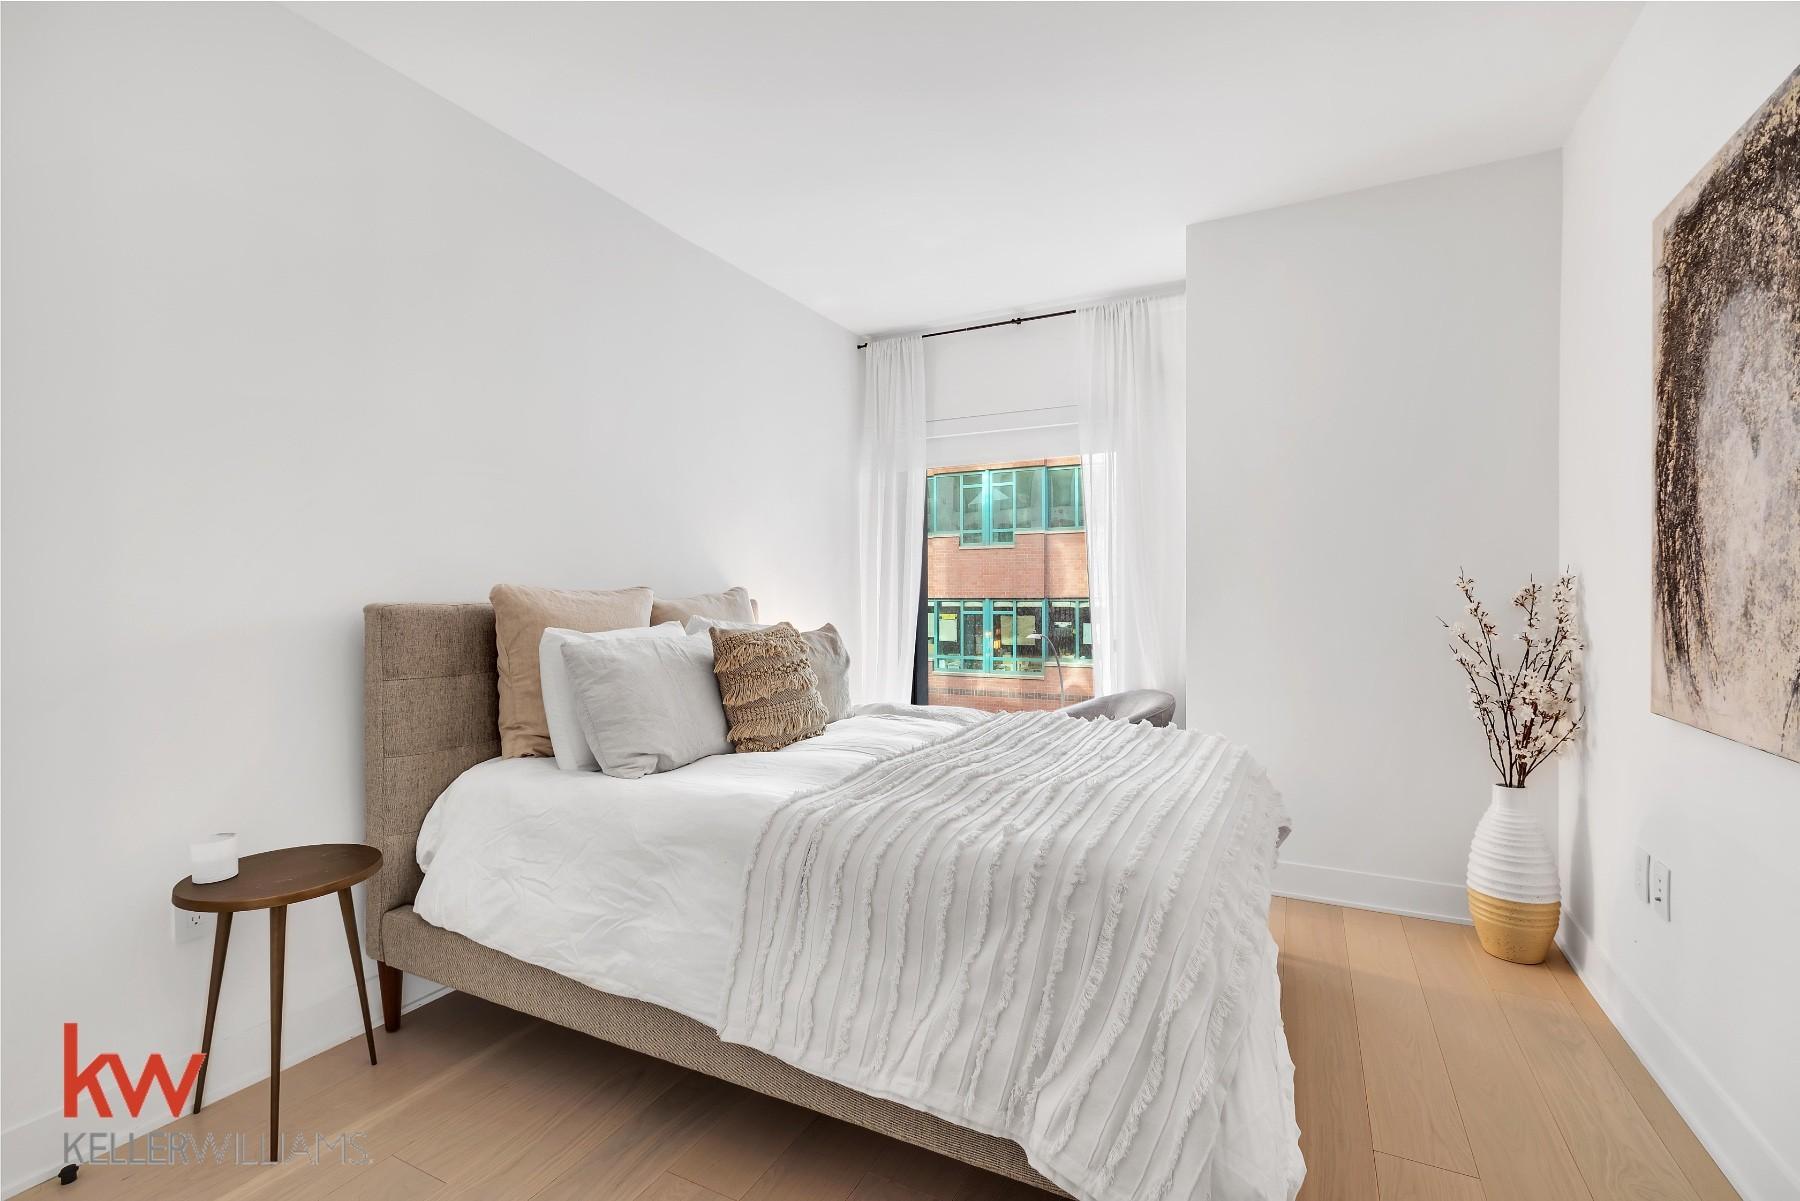 55 West 17th Street Flatiron District New York NY 10011